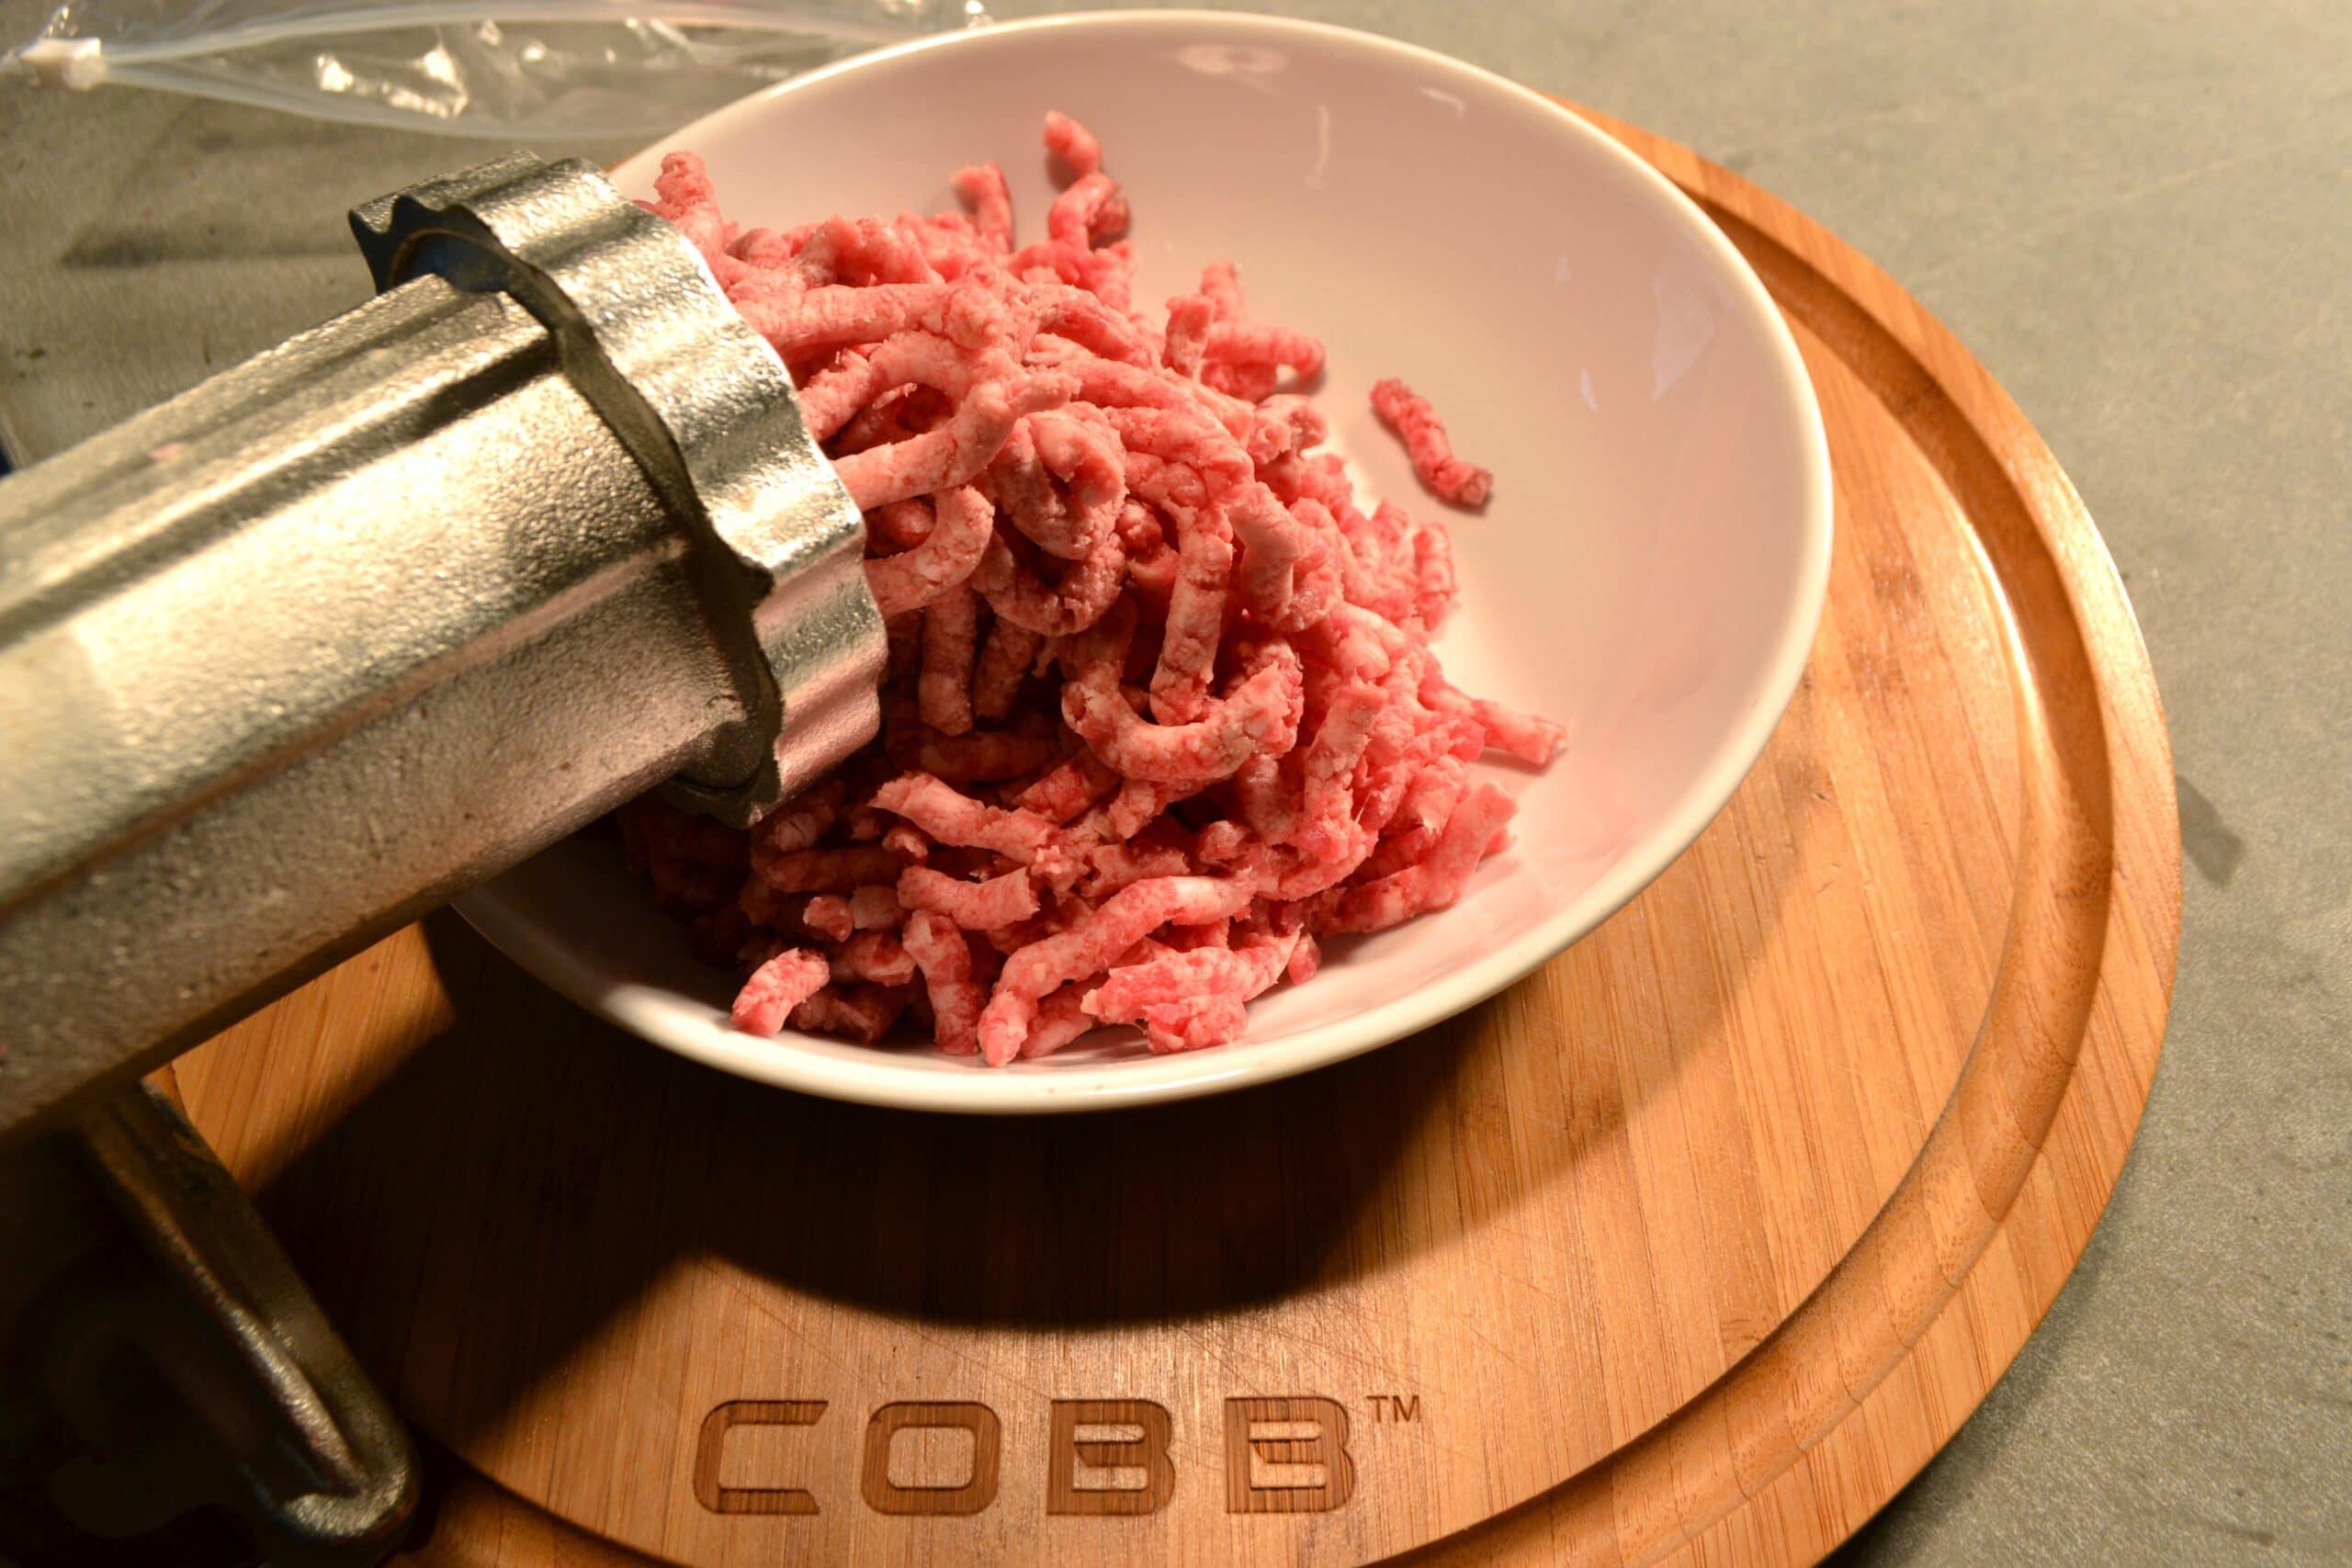 Hamburger BBQ COBB 9